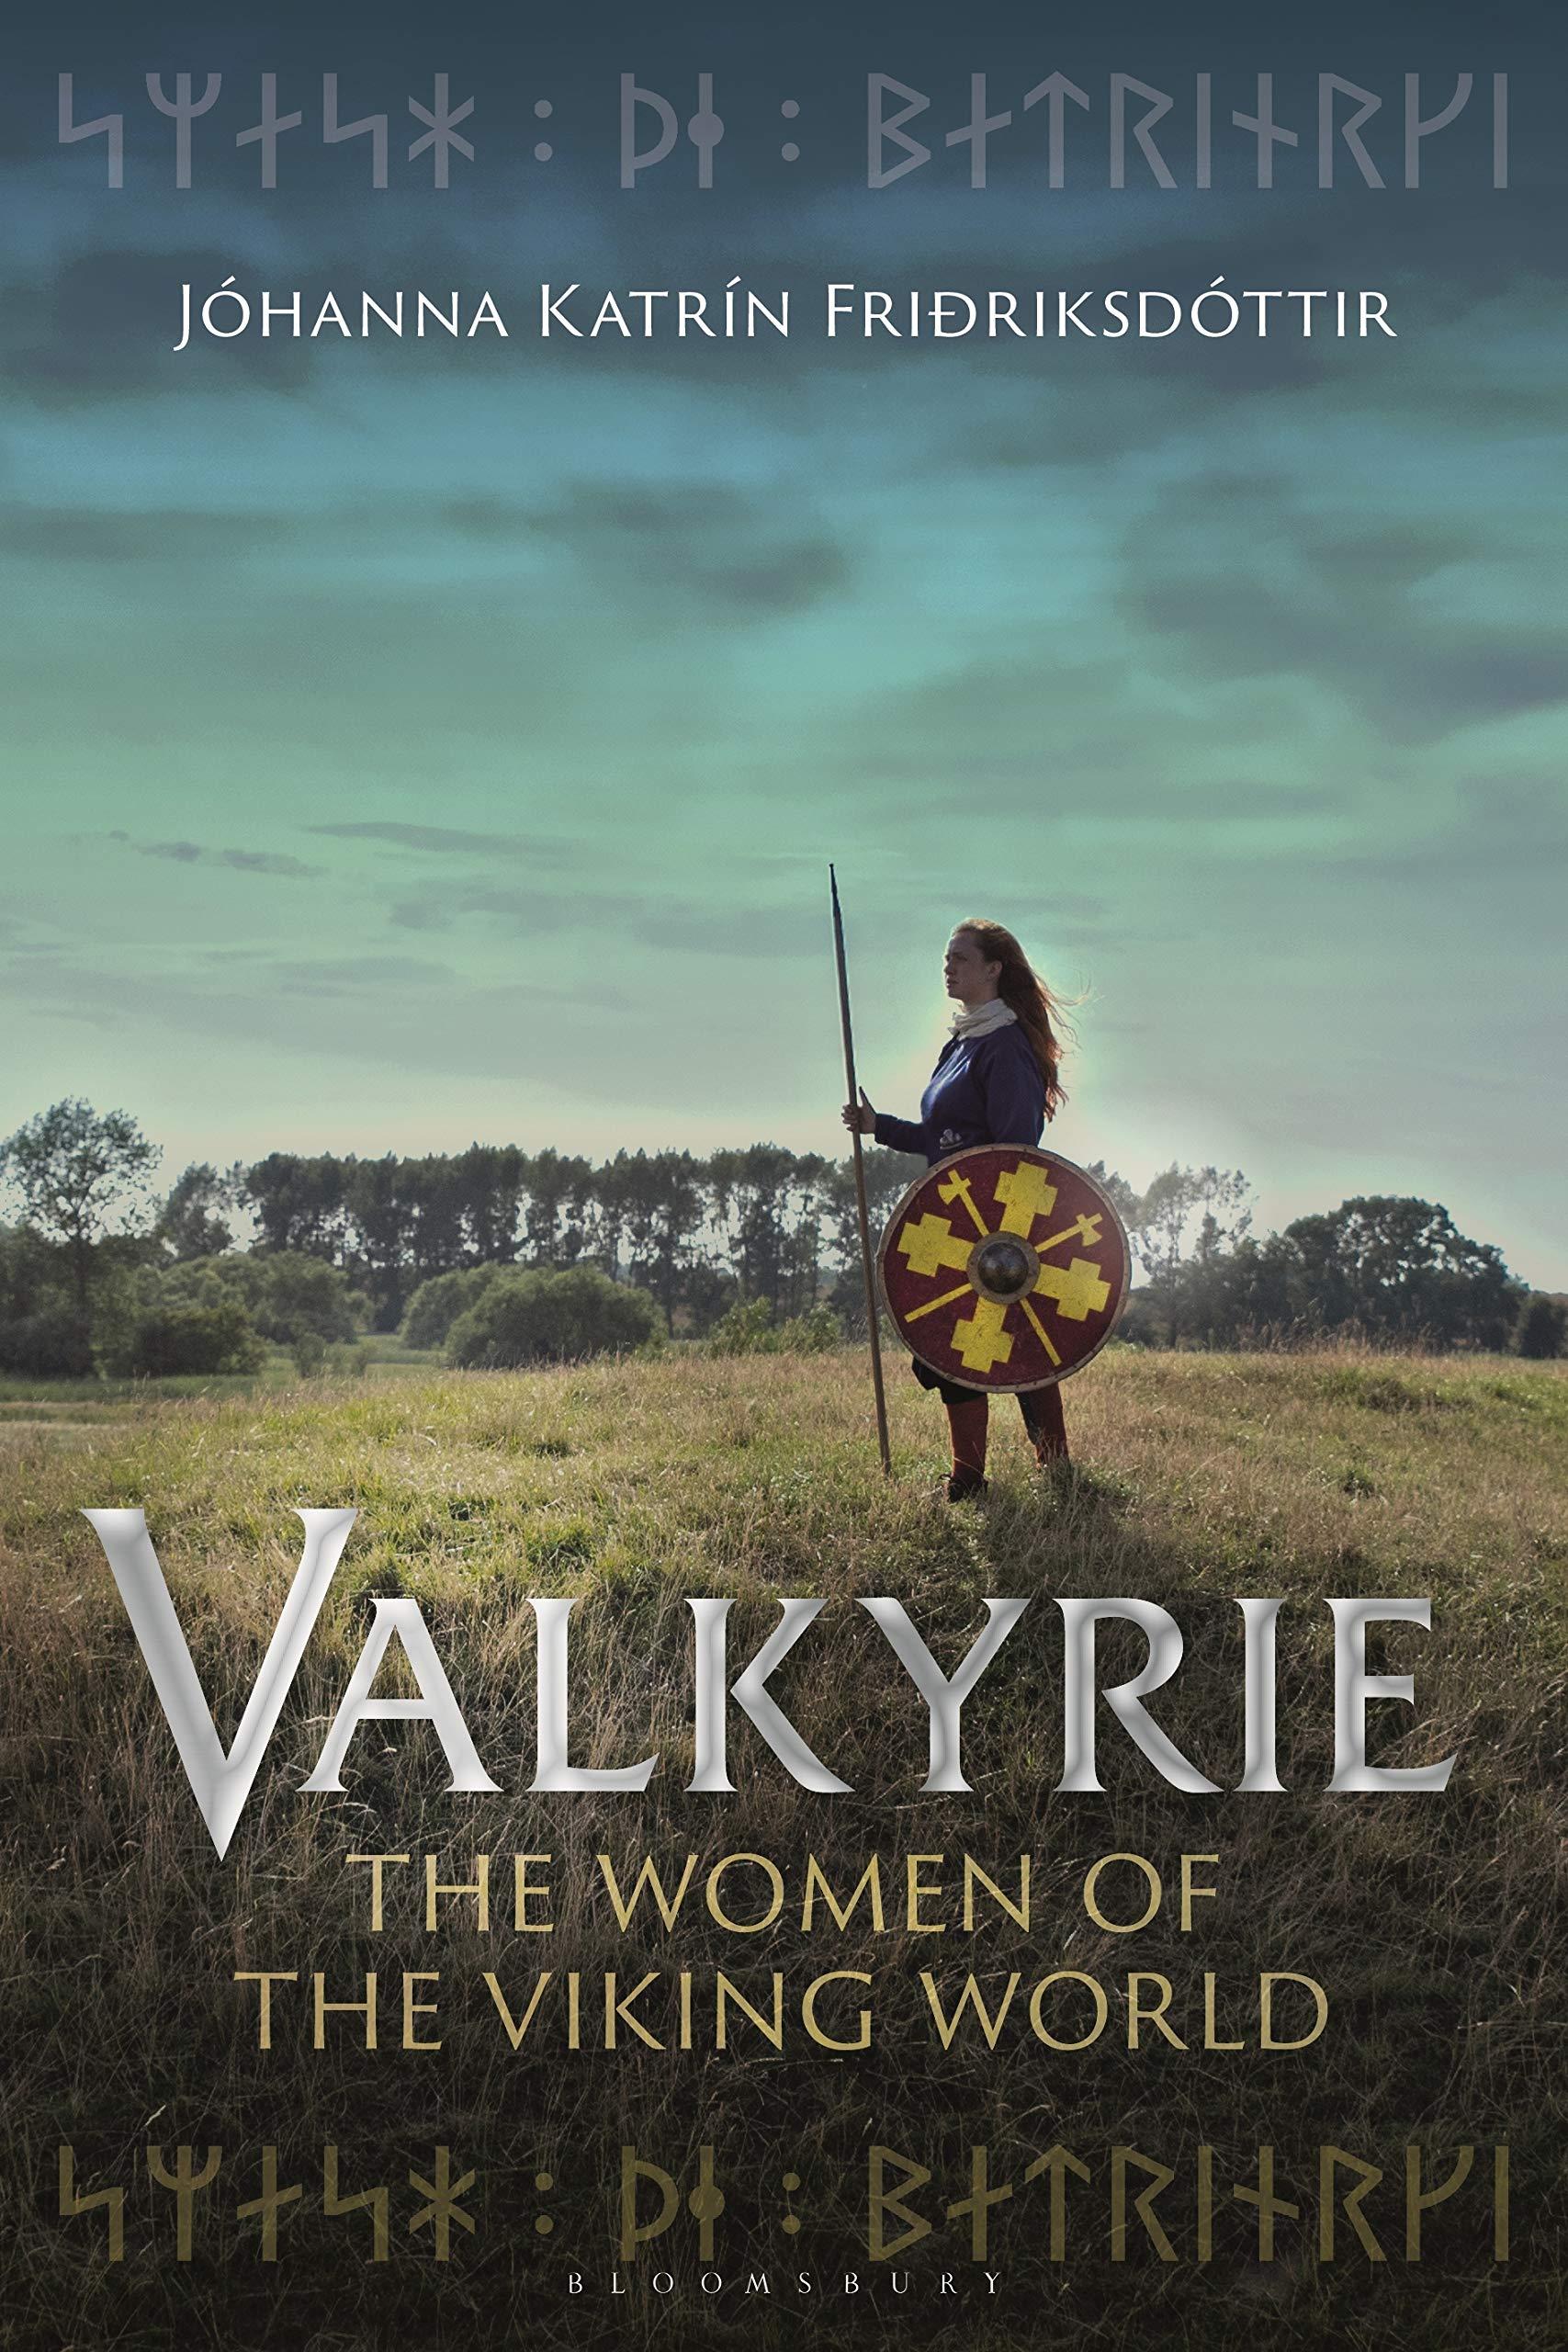 Valkyrie: The Women of the Viking World: Amazon.es: Fririksdttir, Jhanna Katrn: Libros en idiomas extranjeros